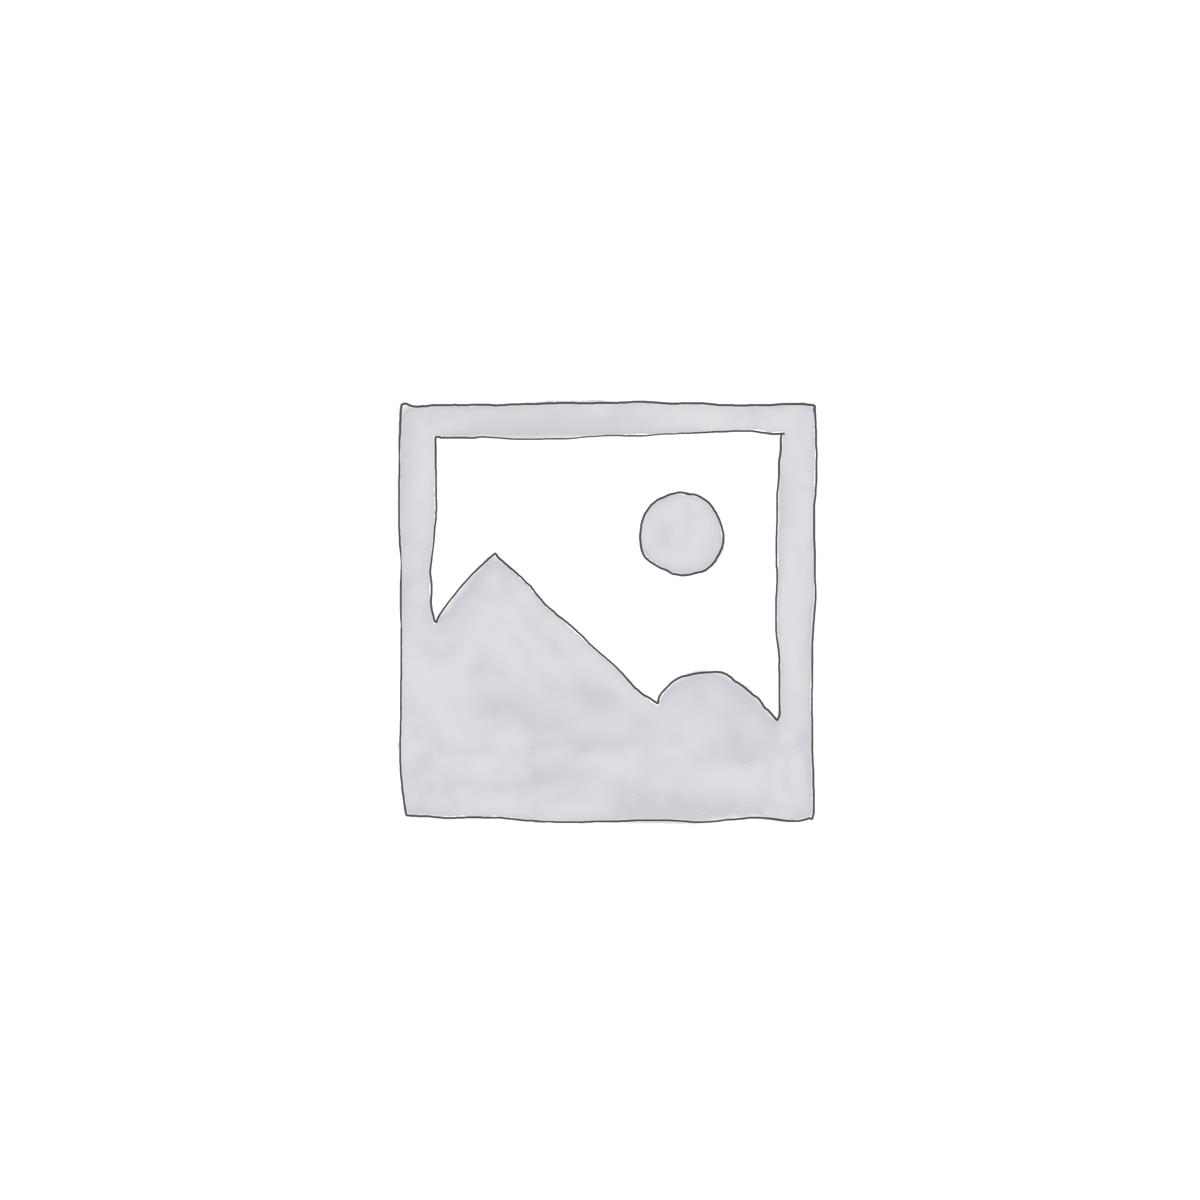 http://www.bobovr.com/wp-content/uploads/2019/05/woocommerce-placeholder-1.png